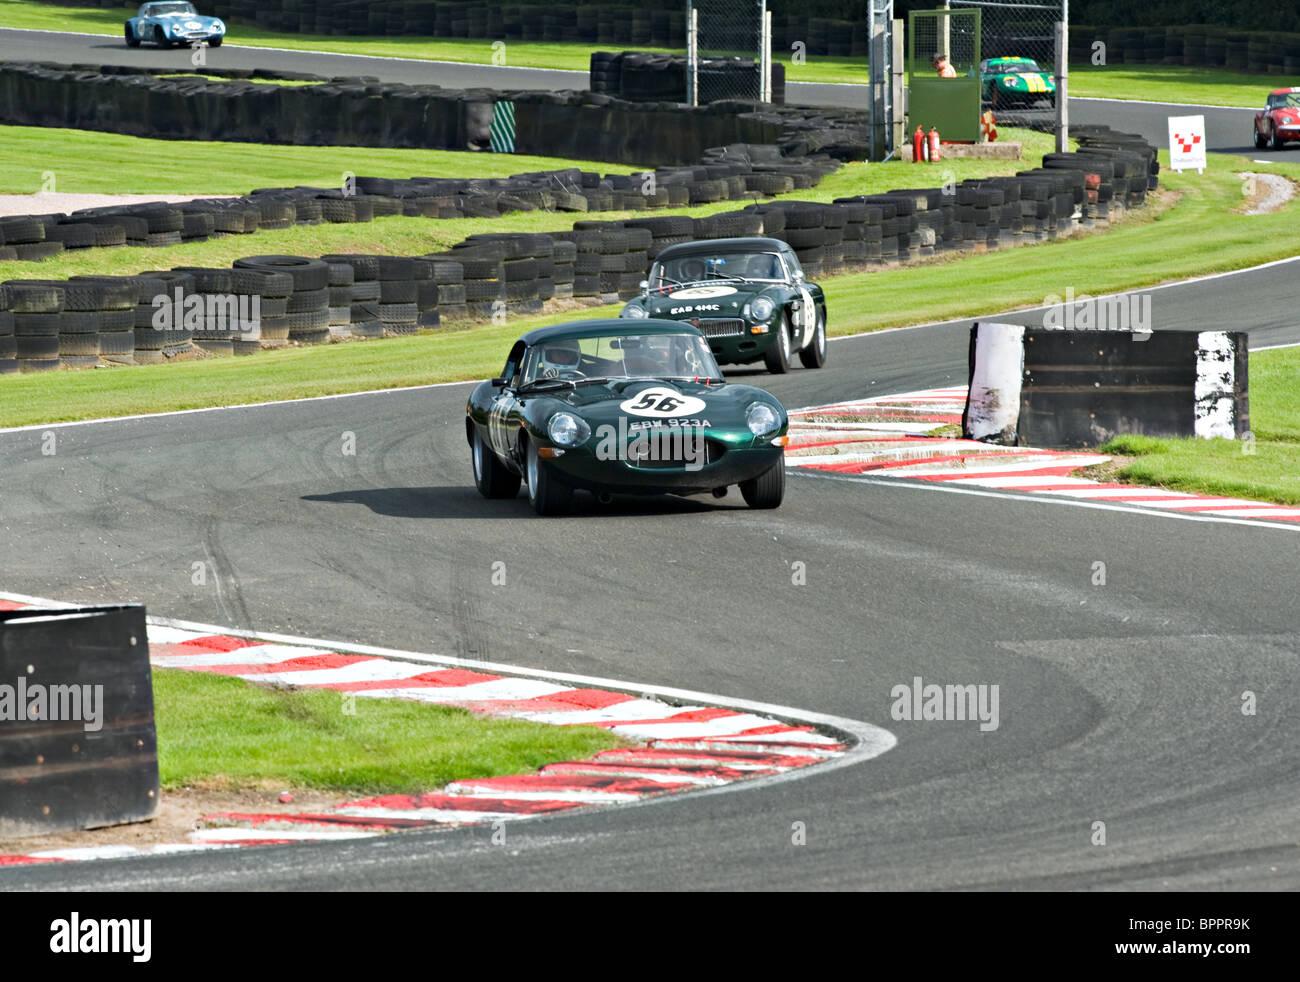 Show Me Your Racing Stripes Black Mg T Moto Et Voitures